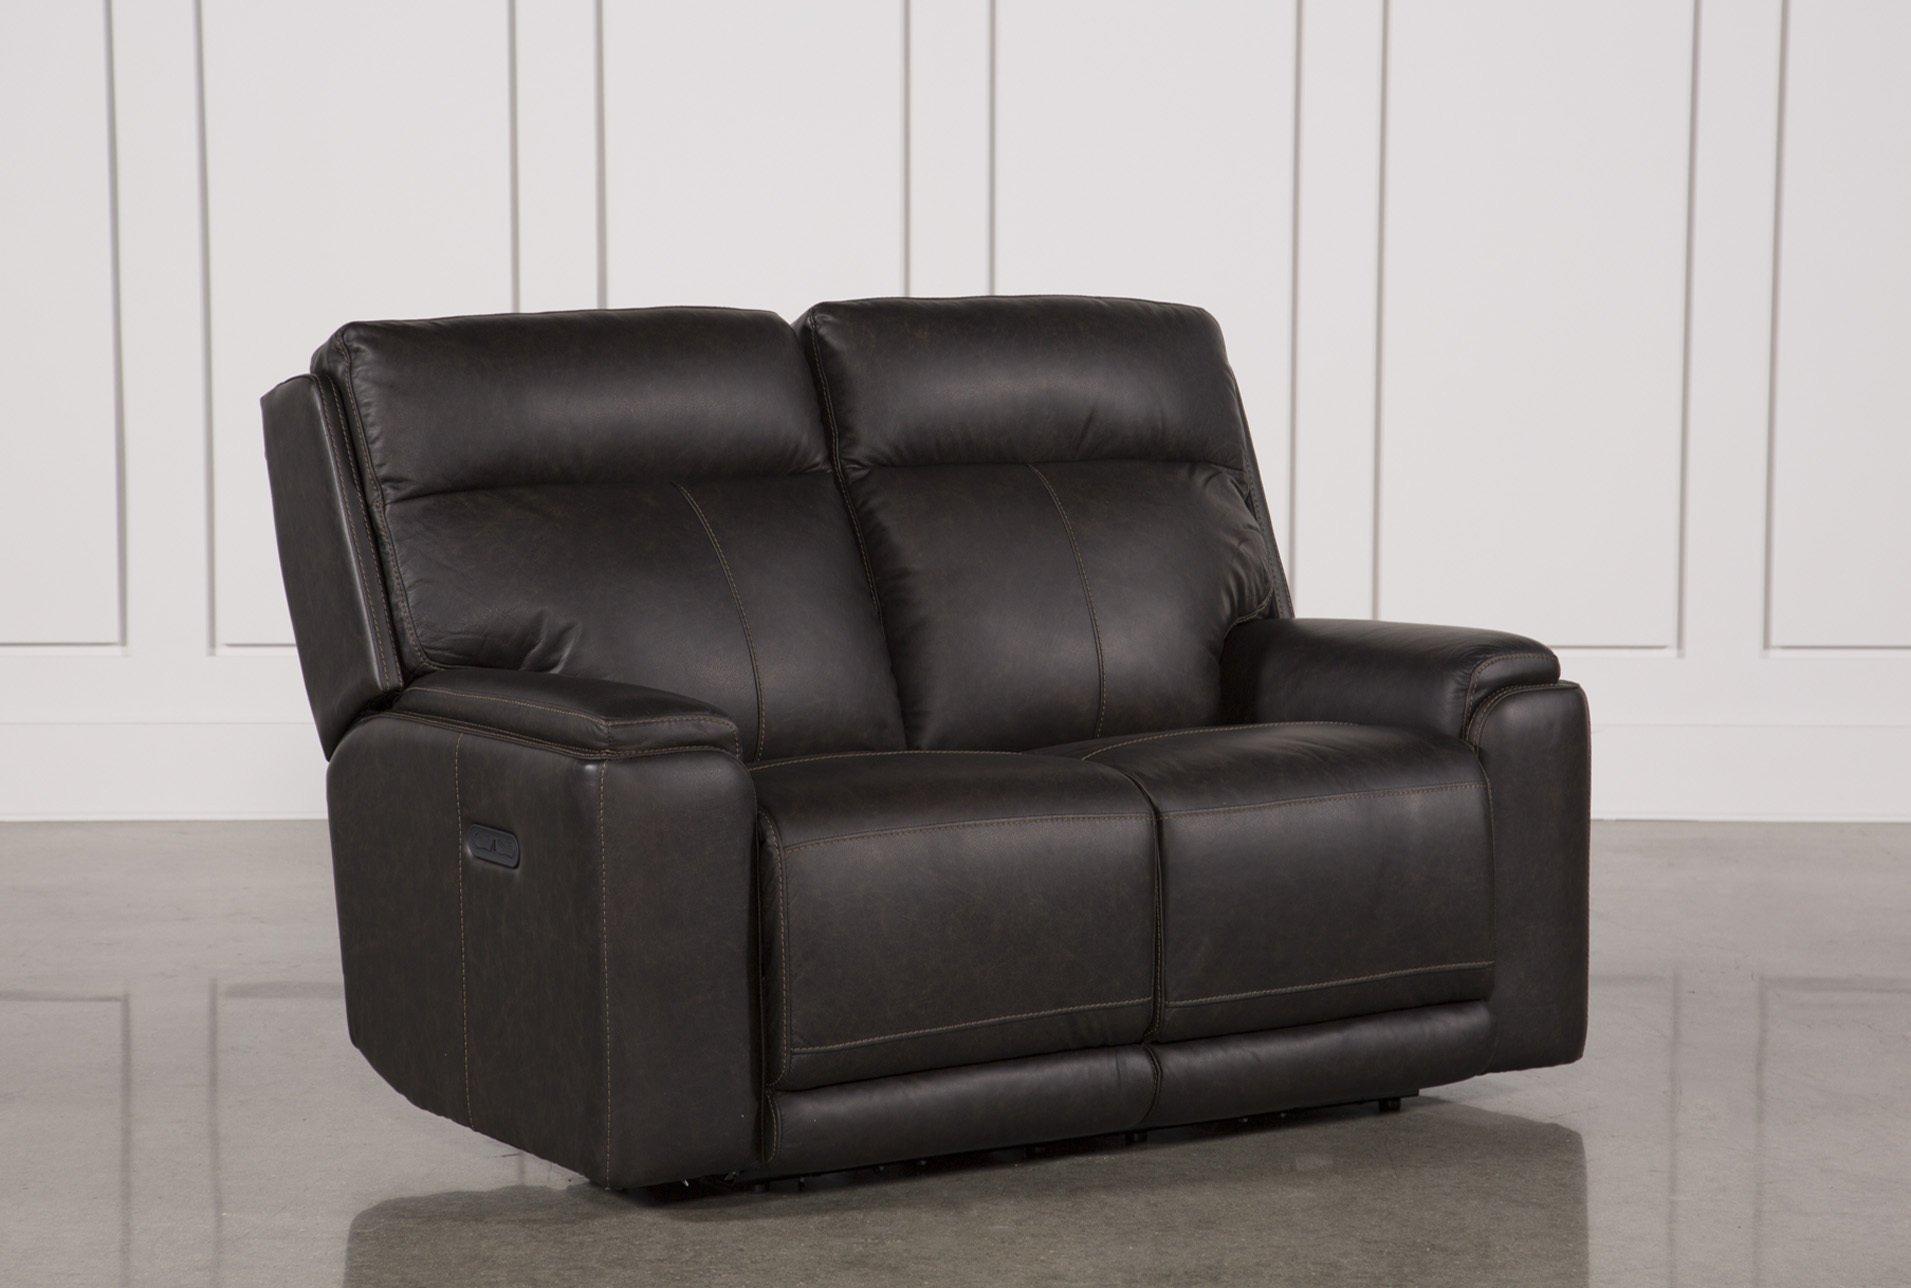 Sinjin Leather Power Reclining Loveseat W/Power Headrest | Living Spaces